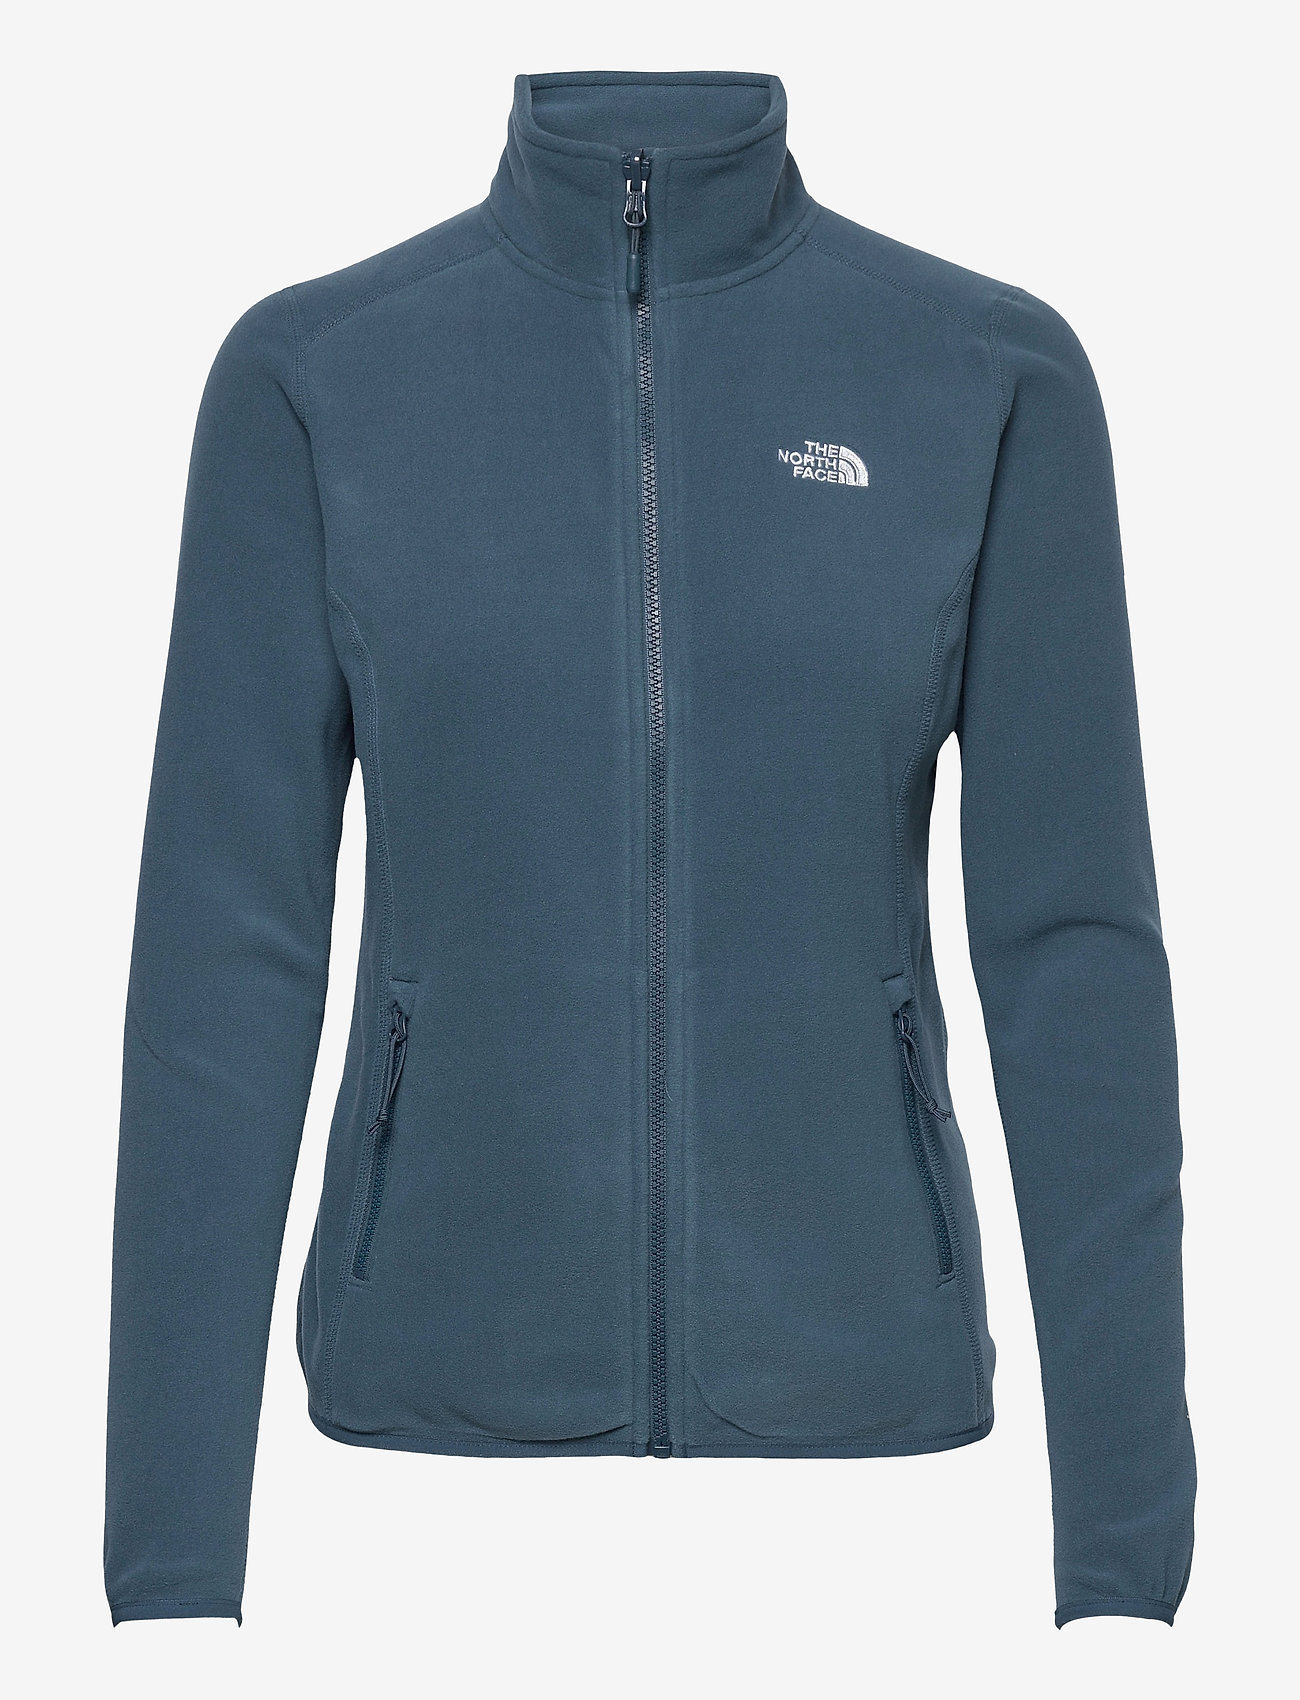 The North Face - W 100 GLACIER FULL ZIP - EU - fleece - monterey blue - 0